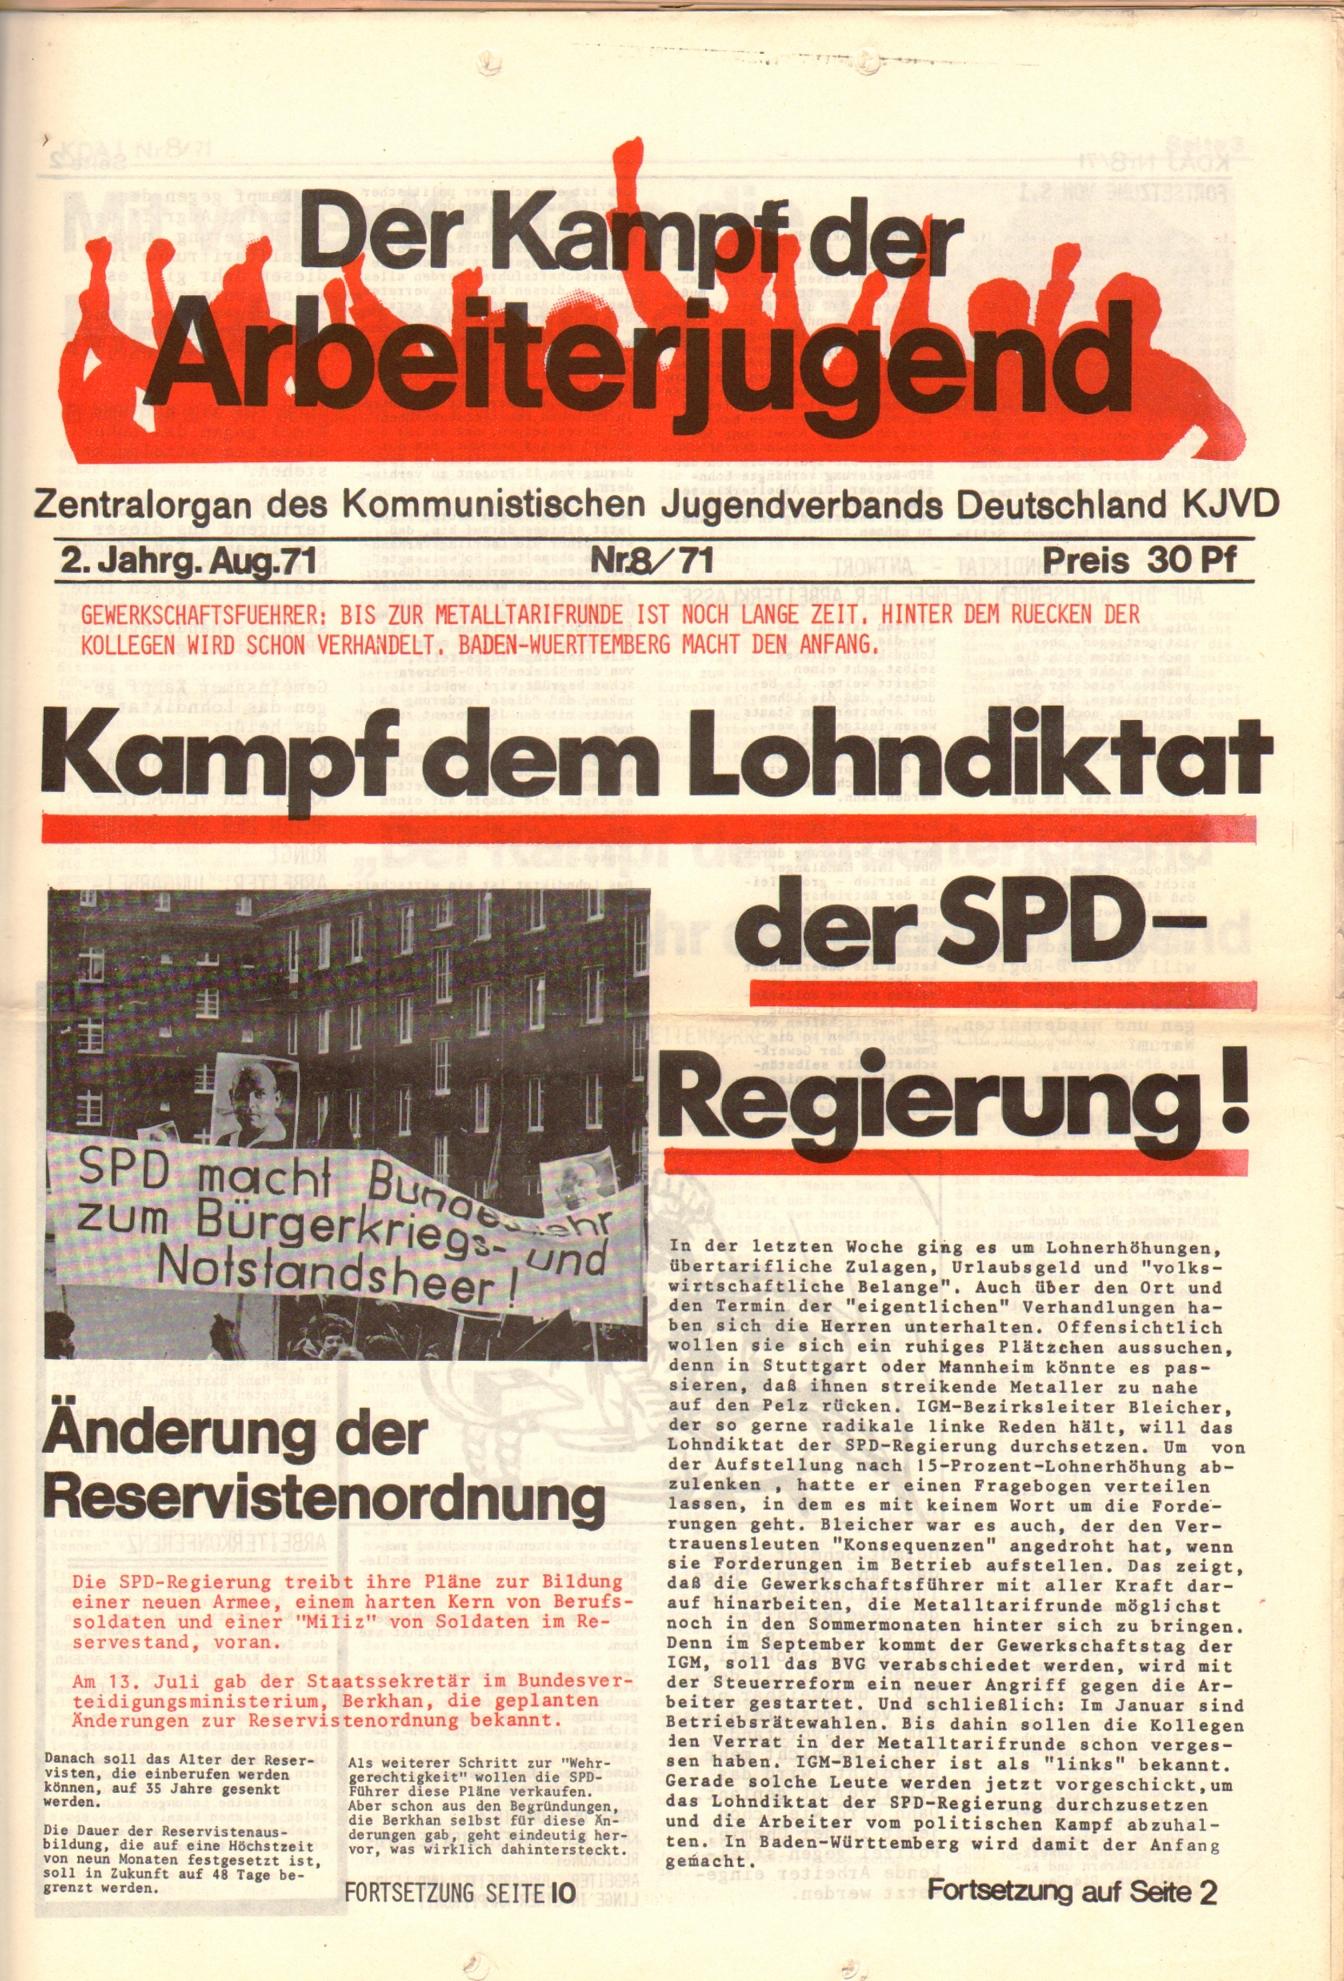 KDAJ, 2. Jg., August 1971, Nr. 8, Seite 1